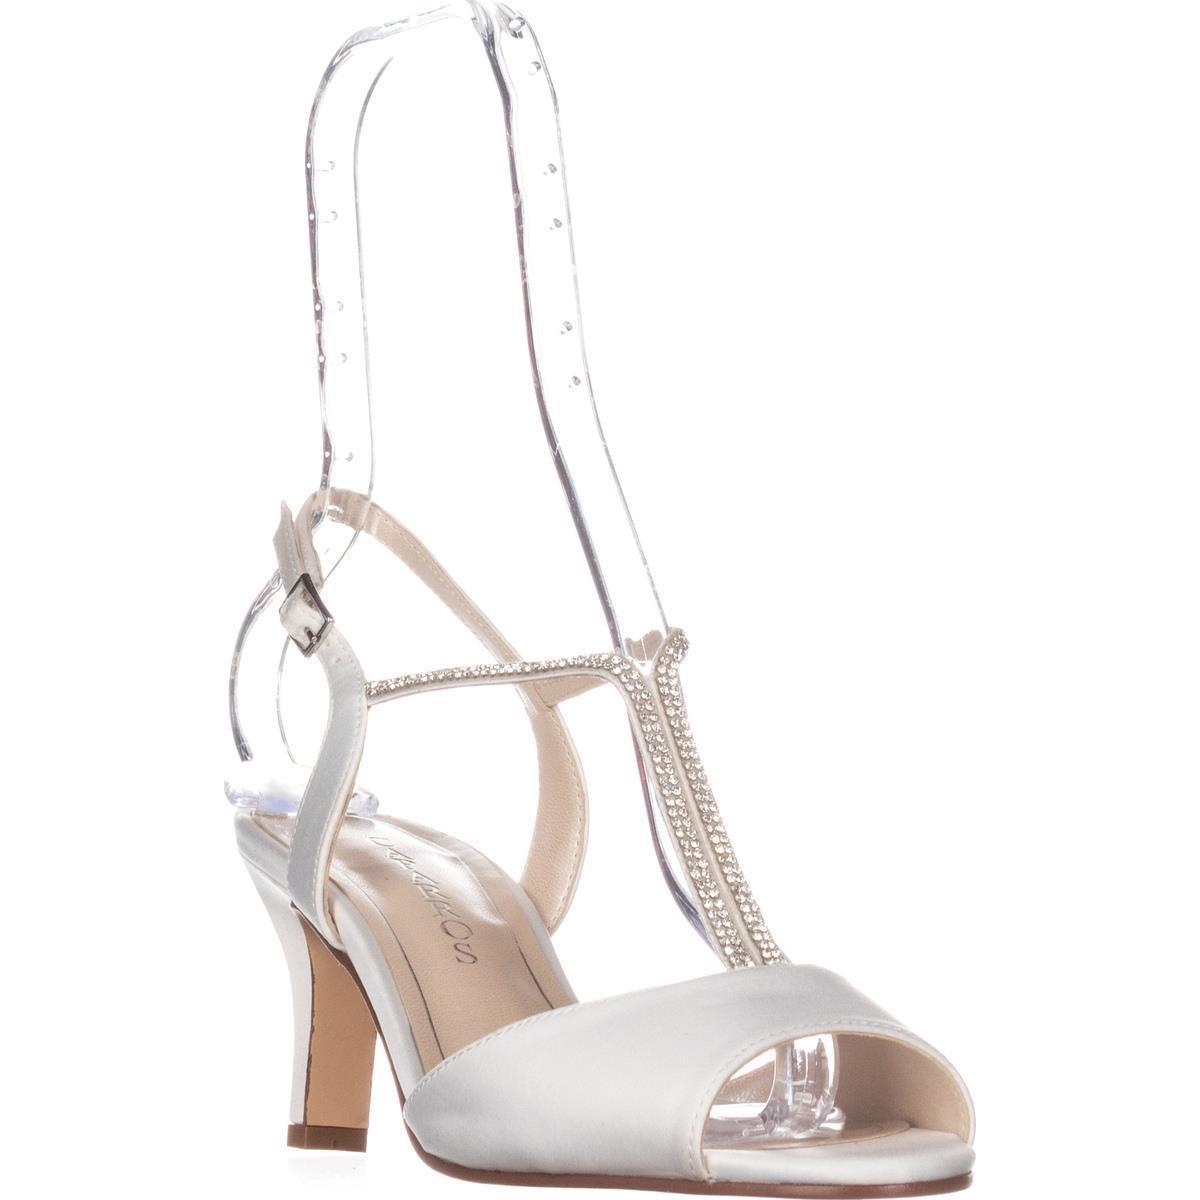 e2573d99f88 Lyst - Caparros Delicia Sparkle T-strap Peep Toe Dress Sandals in White